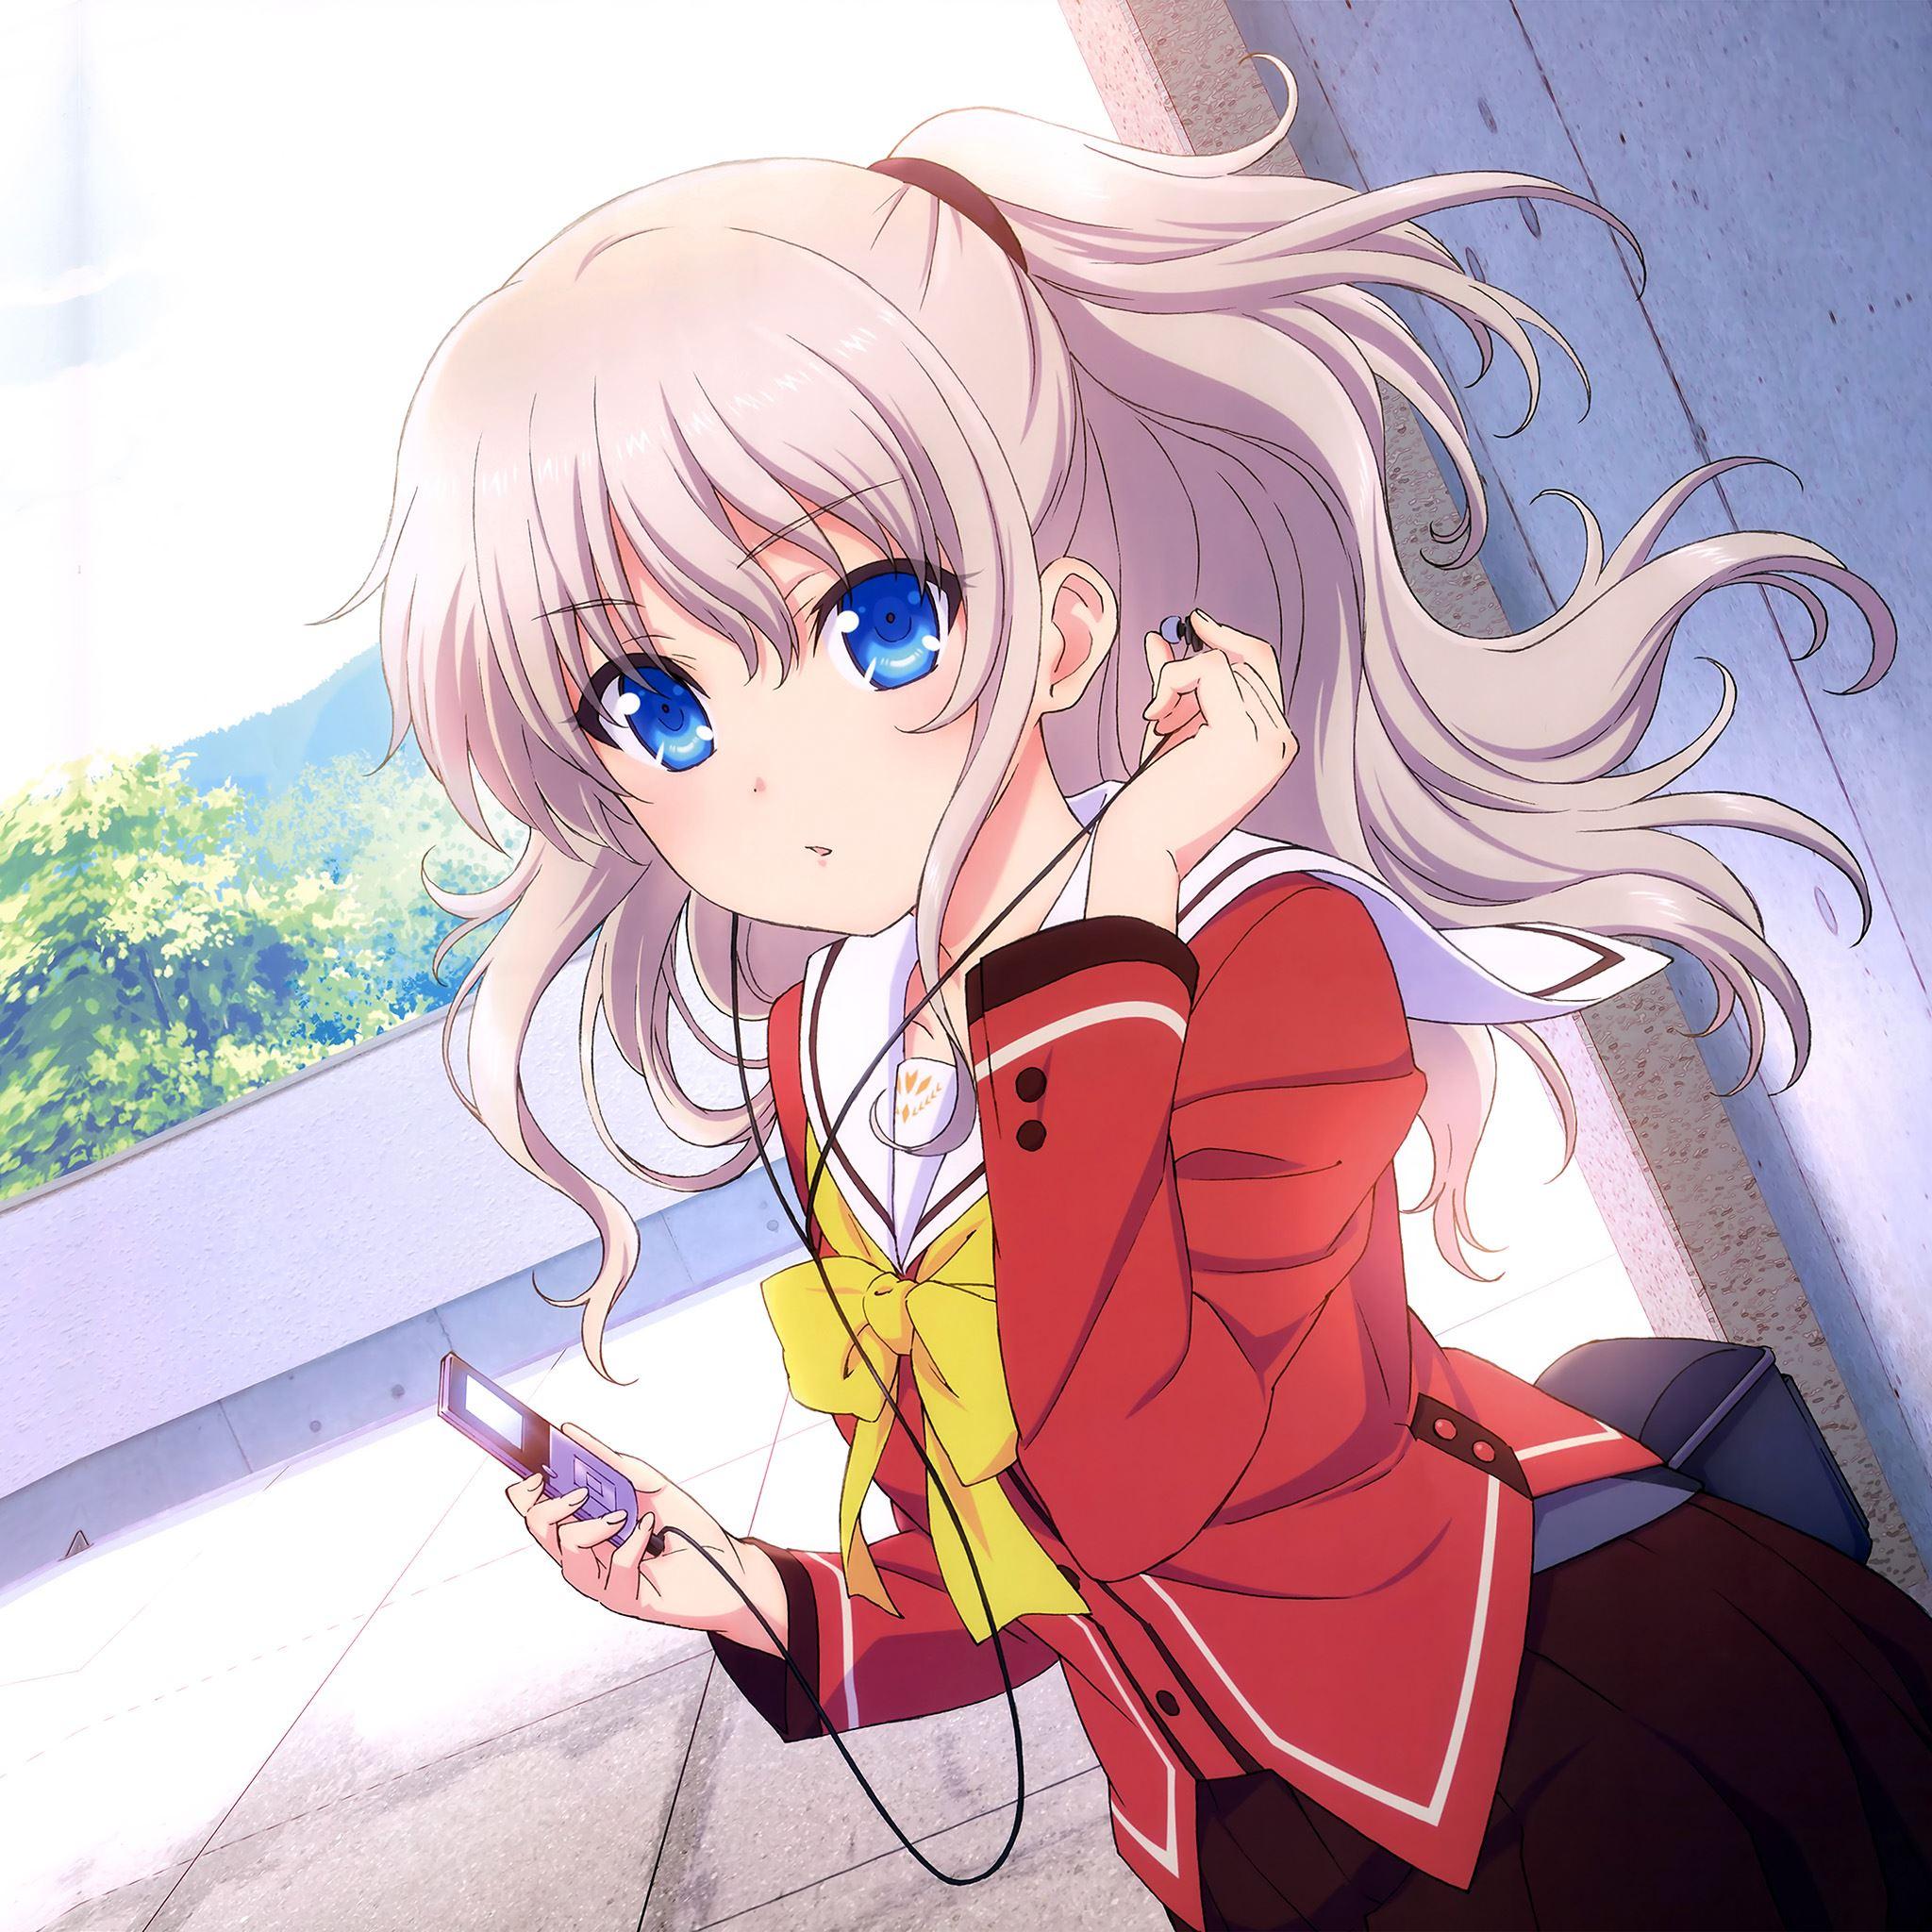 Chalorette Anime Girl Cute Art Illustration iPad Air wallpaper